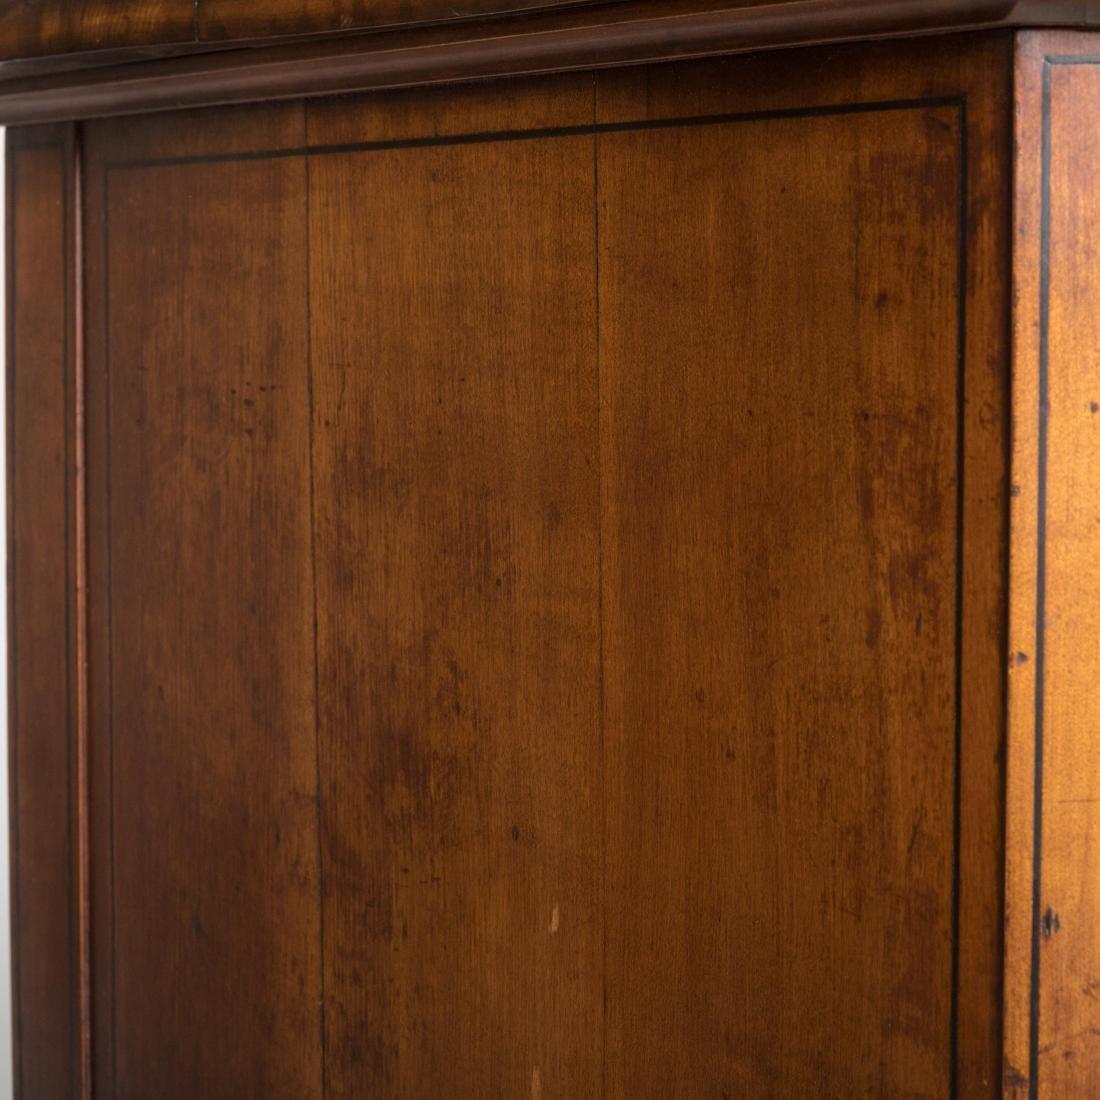 Mahogany Sideboard - 7